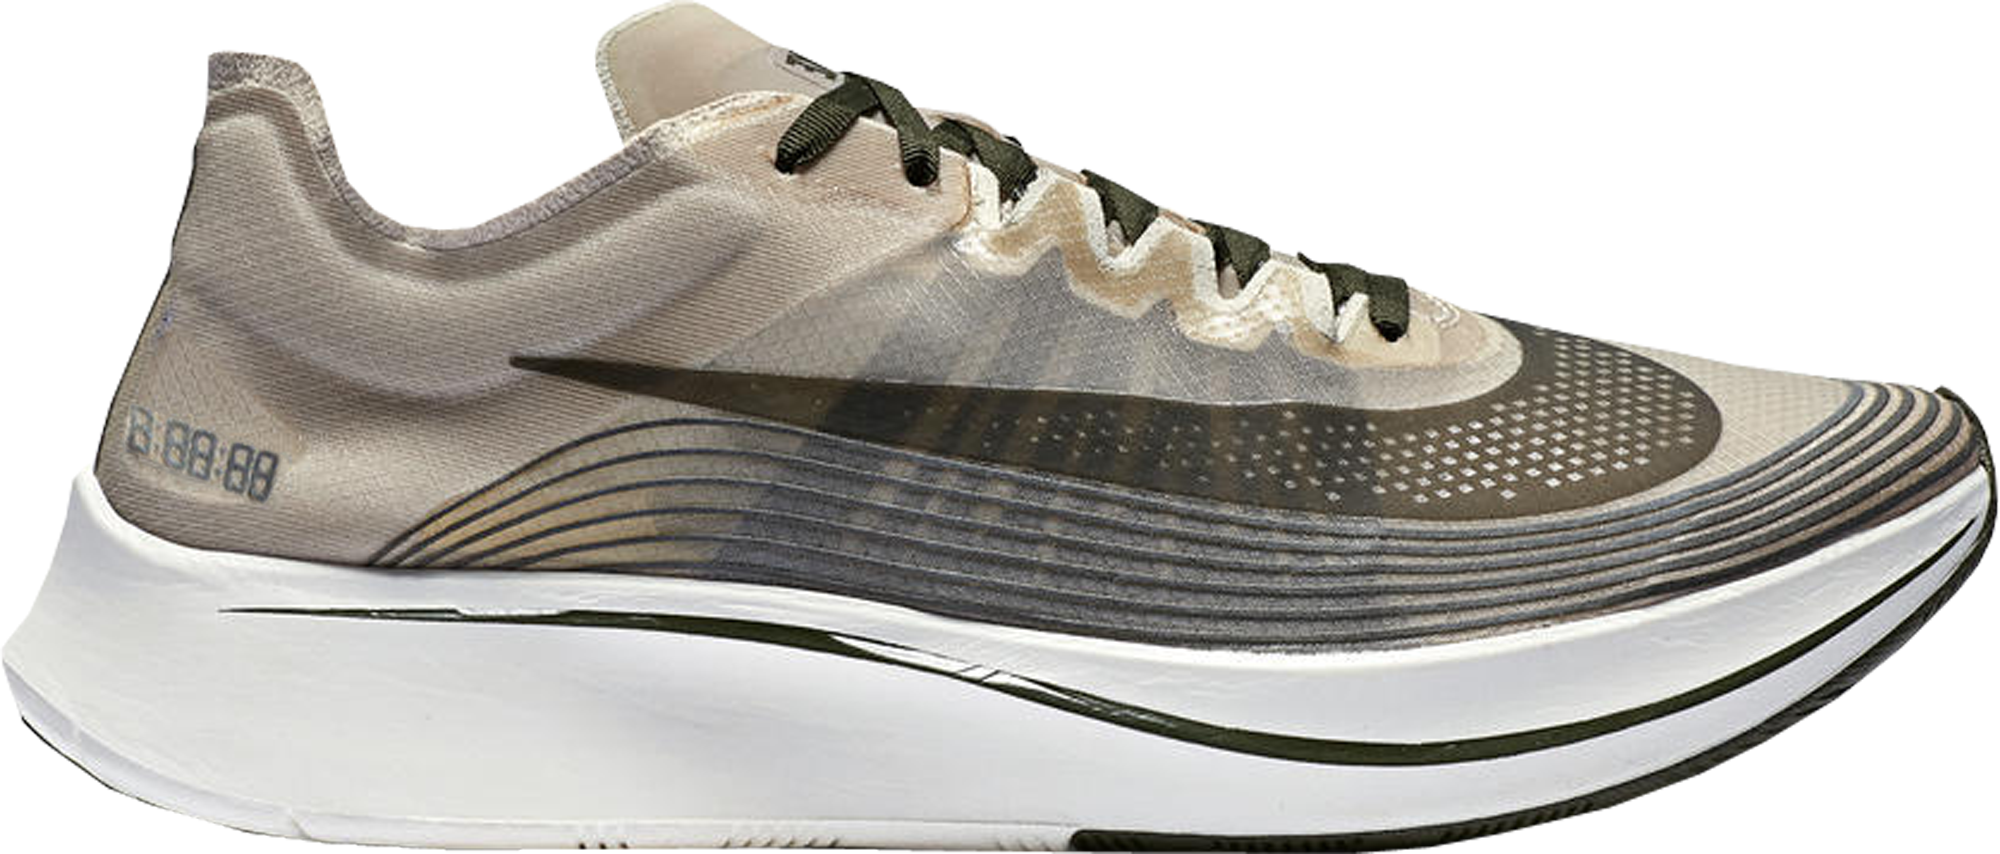 Nike Zoom Fly Shanghai - AA3172-300